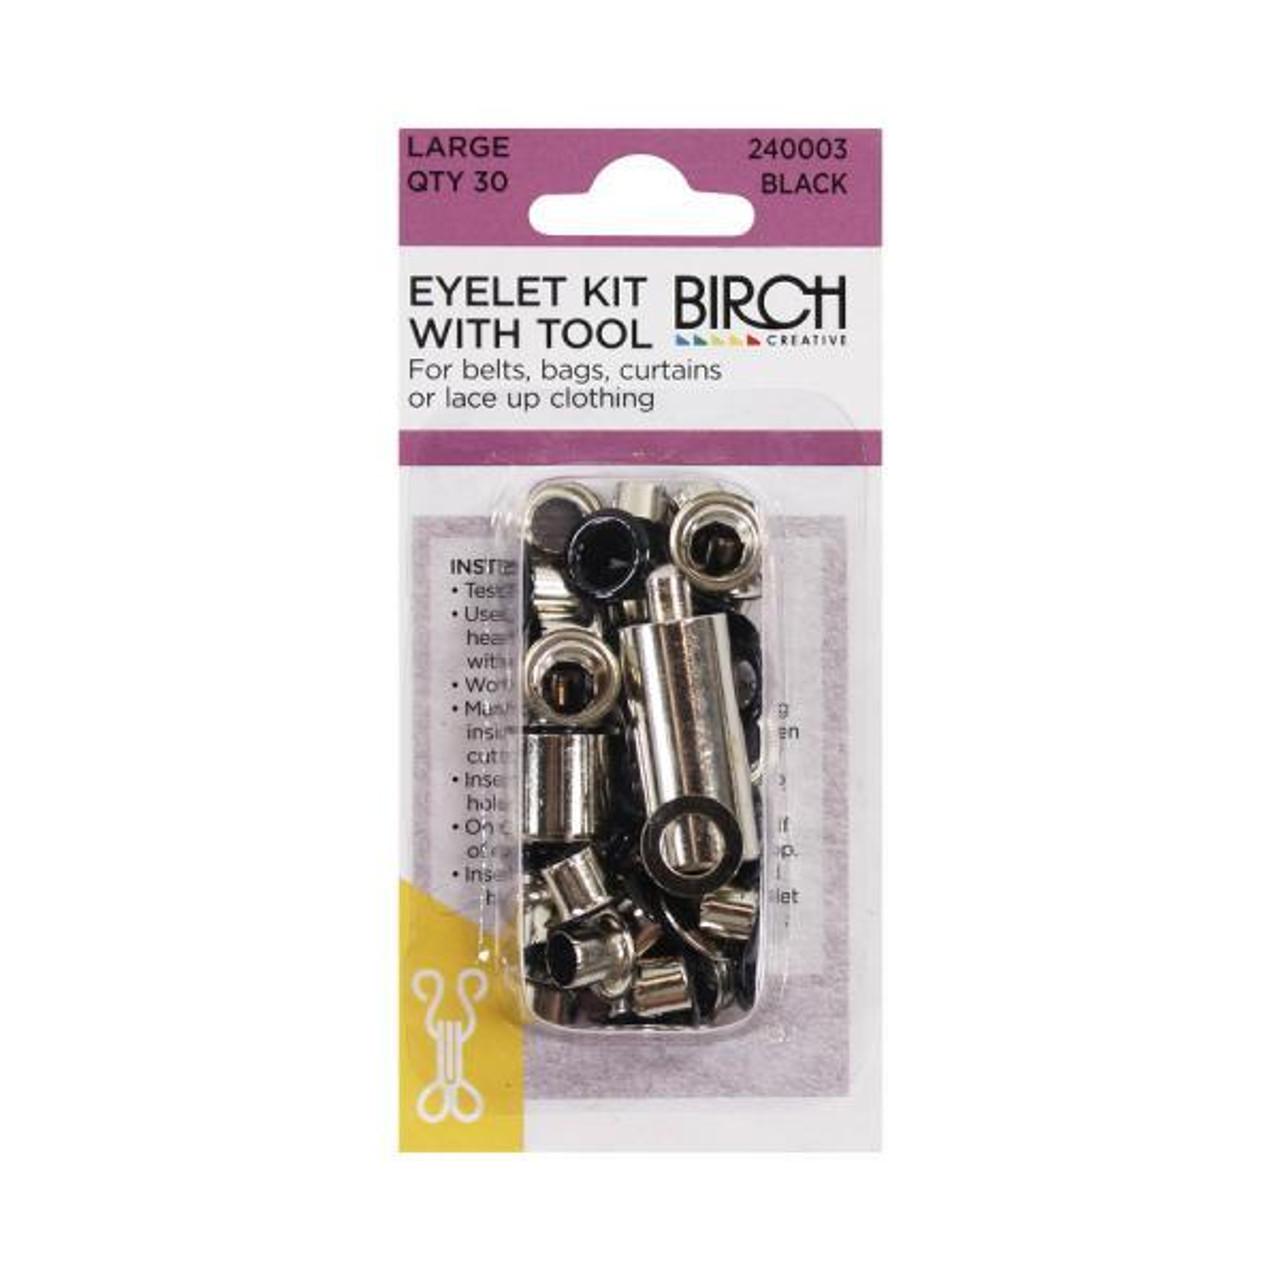 Eyelet Kit and Tool - Large